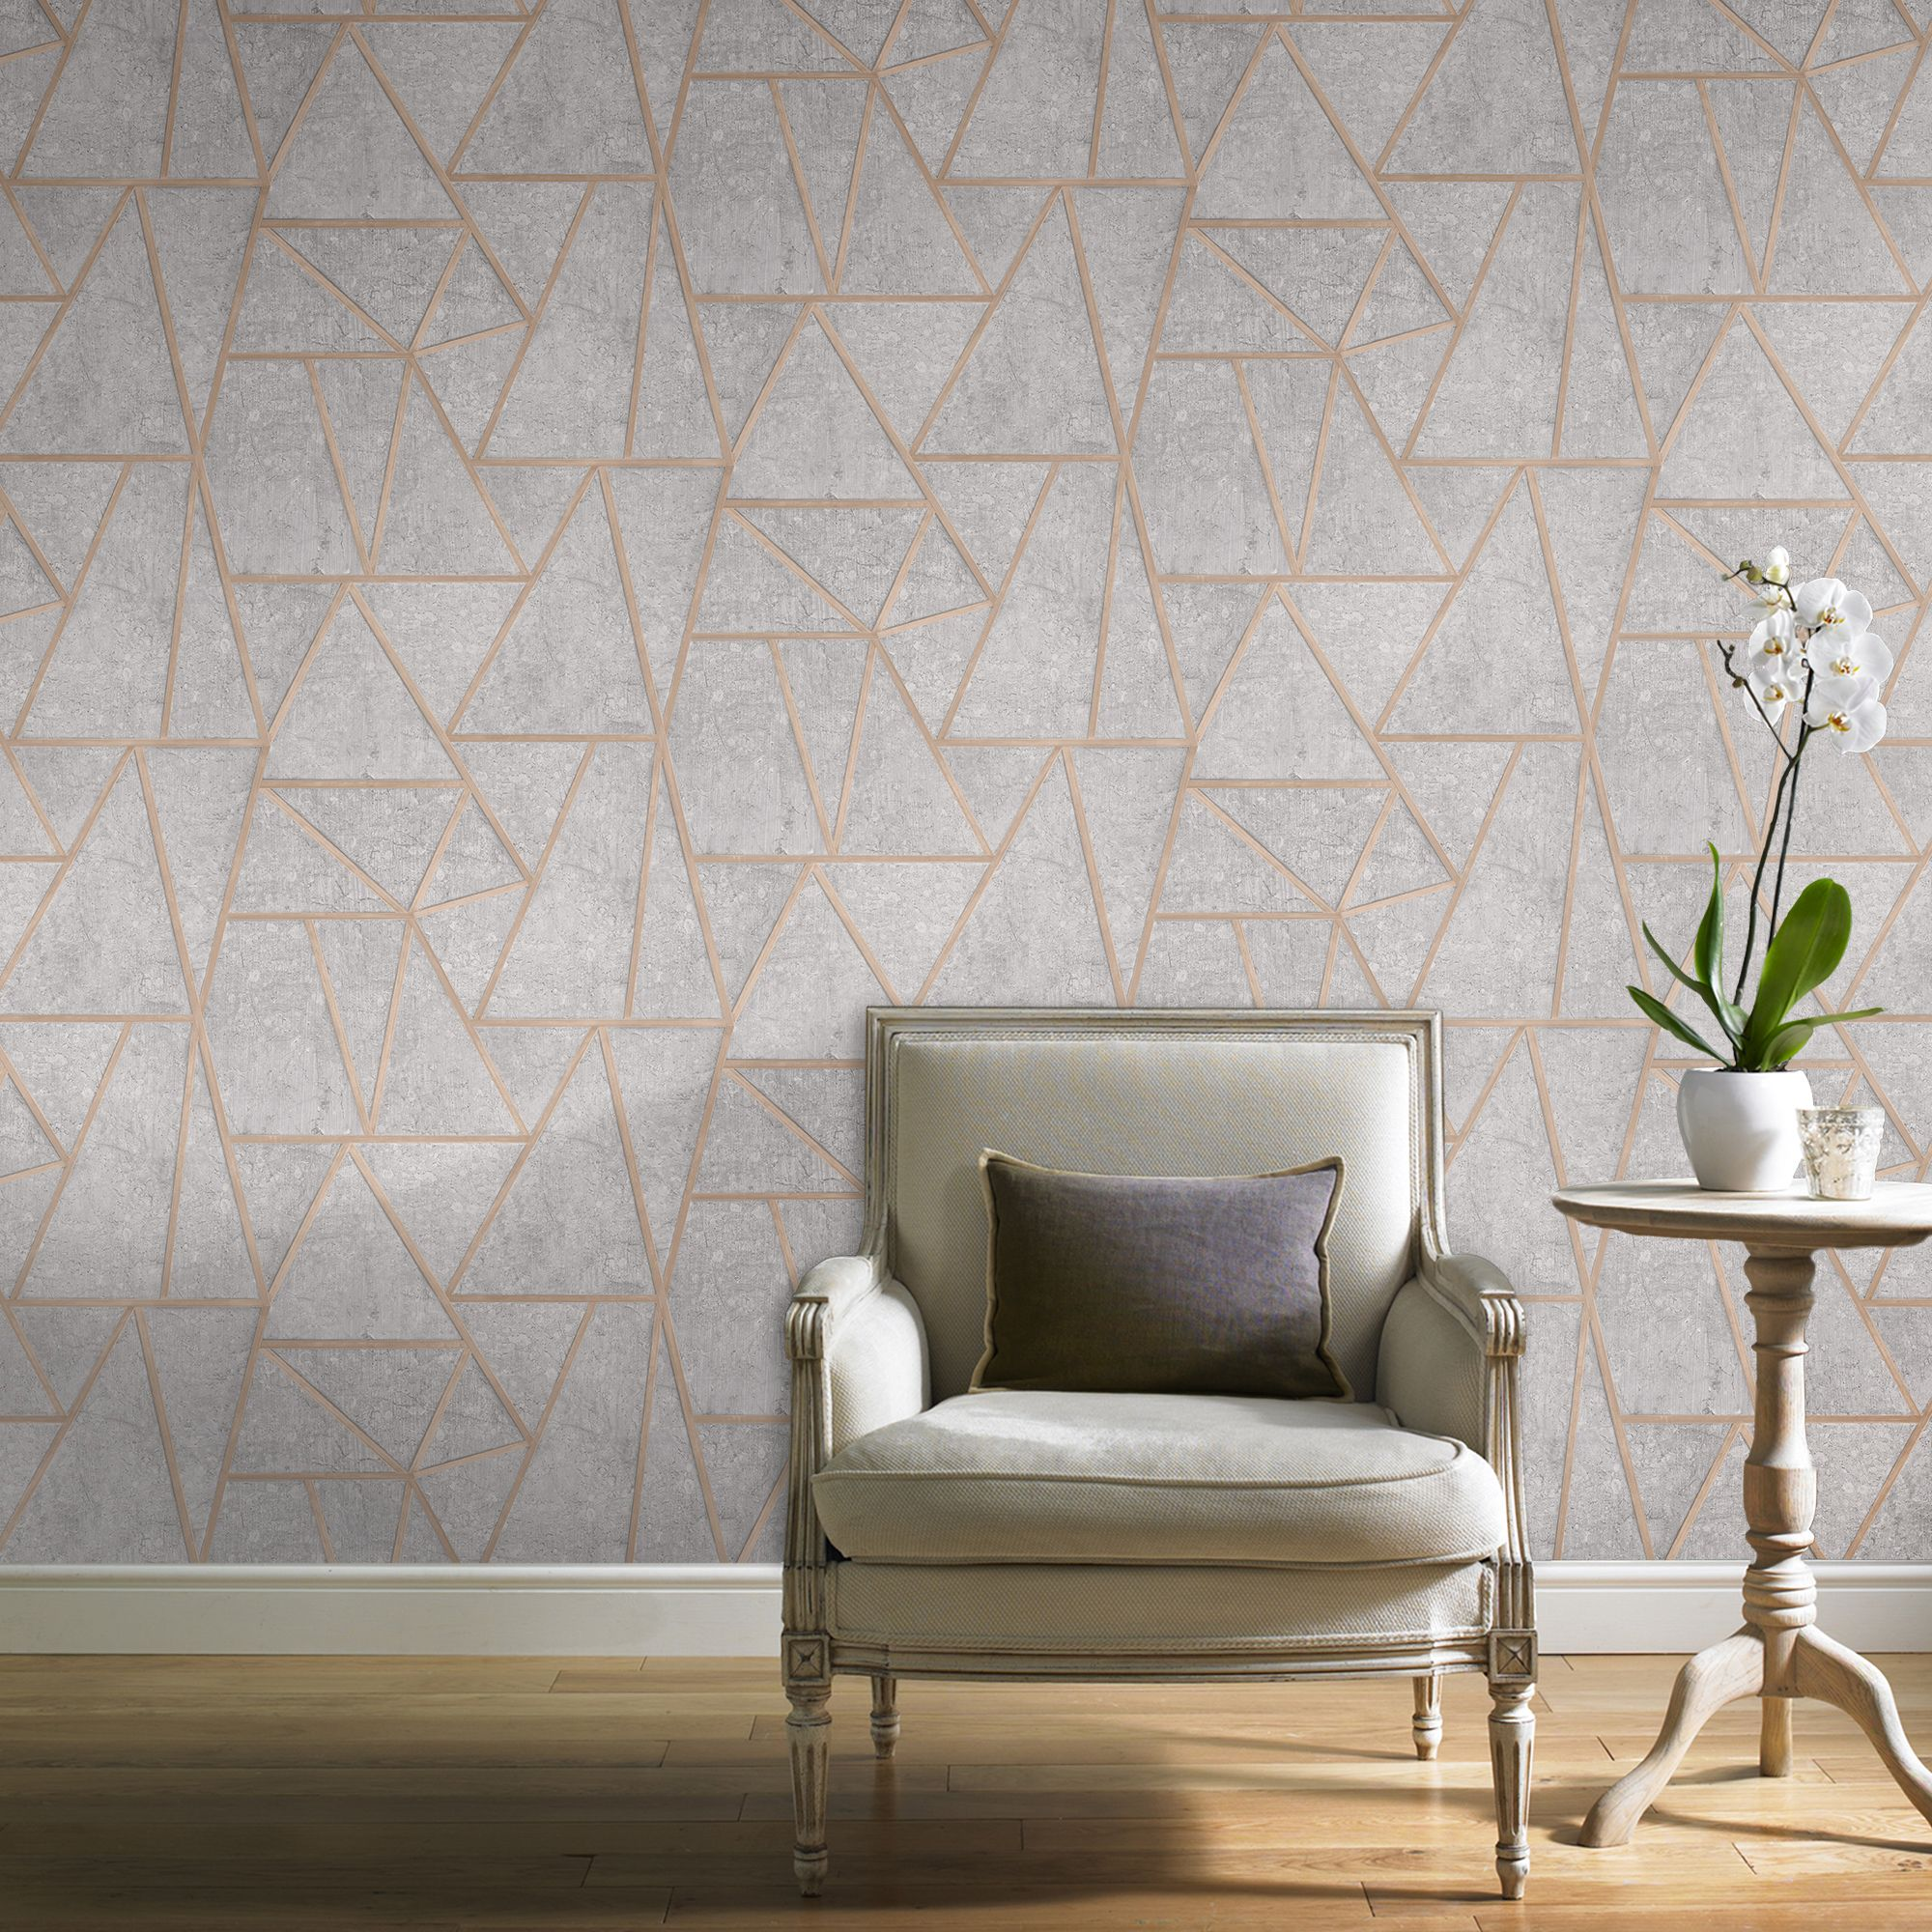 Tapeta Winylowa Na Flizelinie Goodhome Lertif Home Decor Decor Accent Chairs